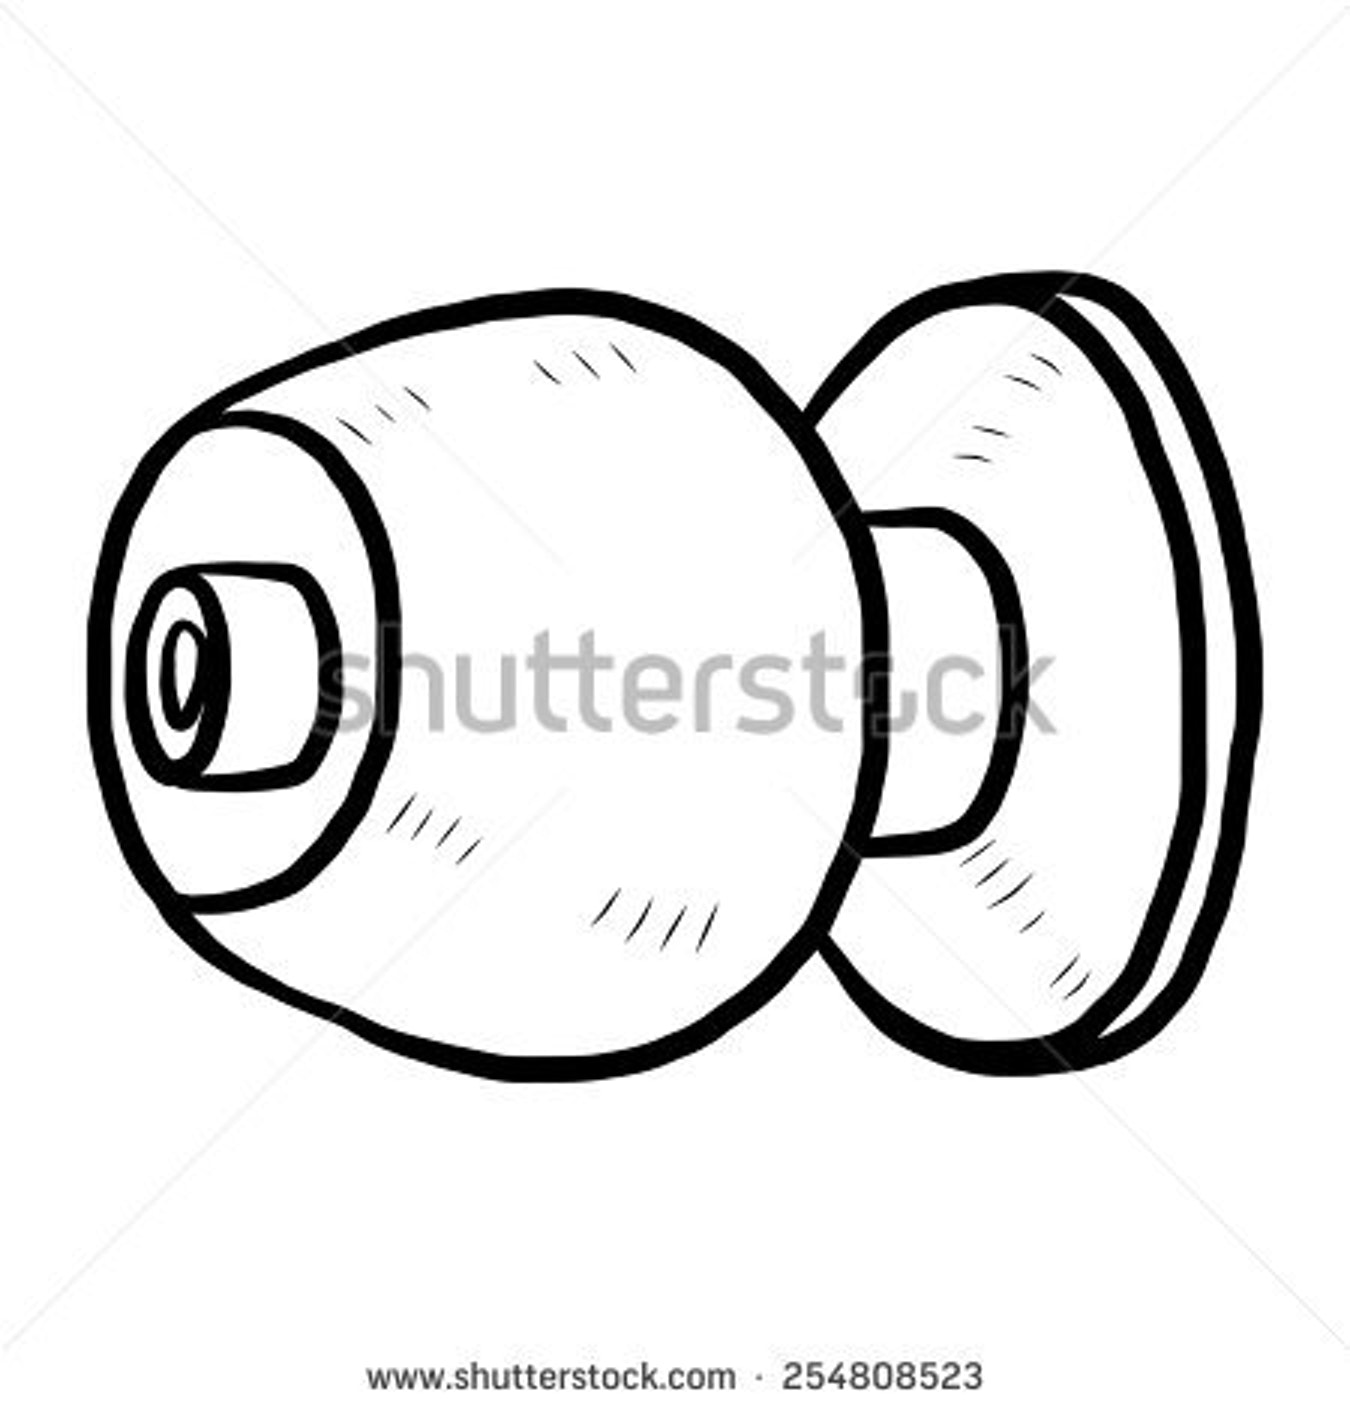 1350x1410 Drawing Door Knob Stock Vector Doorknob Cartoon And Illustration